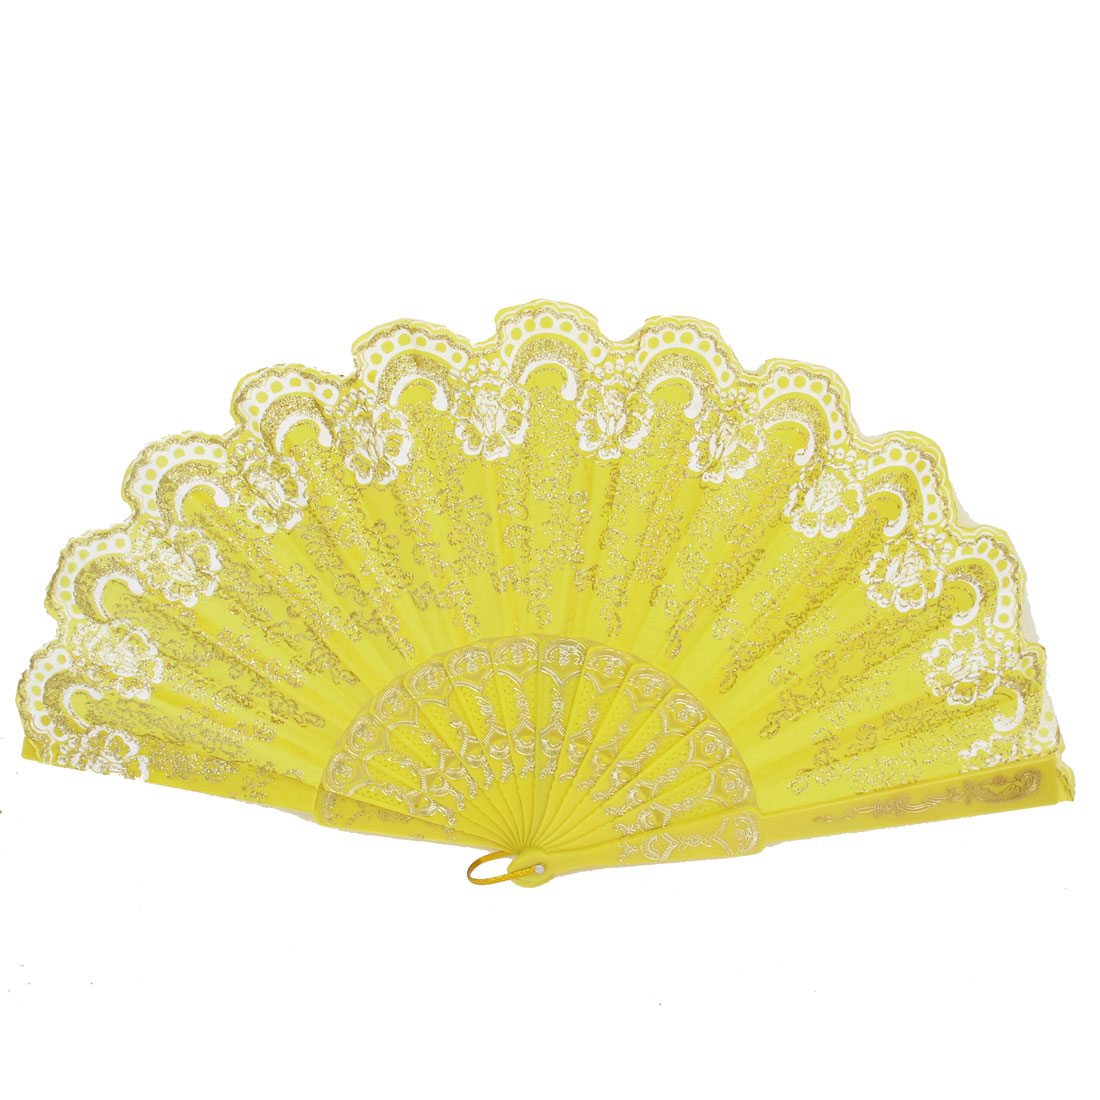 Wedding Party Gift Plastic Rib Glittery Powder Decor Flower Pattern Dancing Folding Hand Fan Yellow